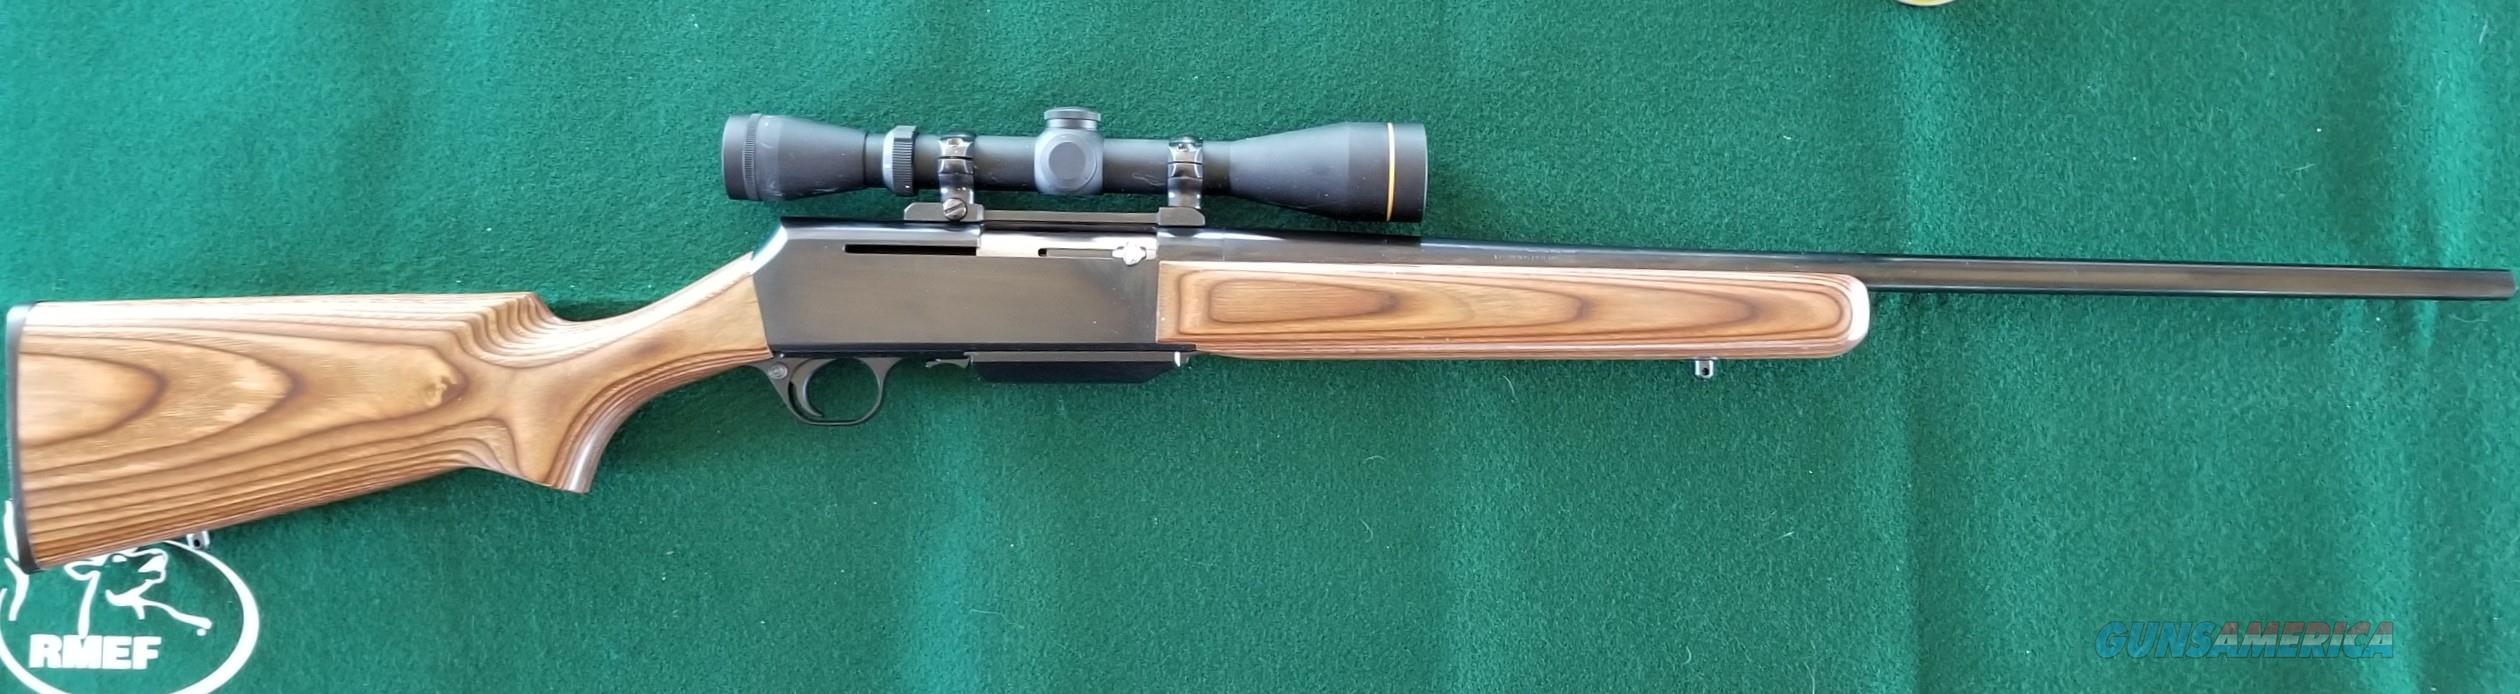 Belgium  Browning BAR 7MM Mag w/ Brand New Leupold VX2  3-9X40 Scope  Guns > Rifles > Browning Rifles > Semi Auto > Hunting